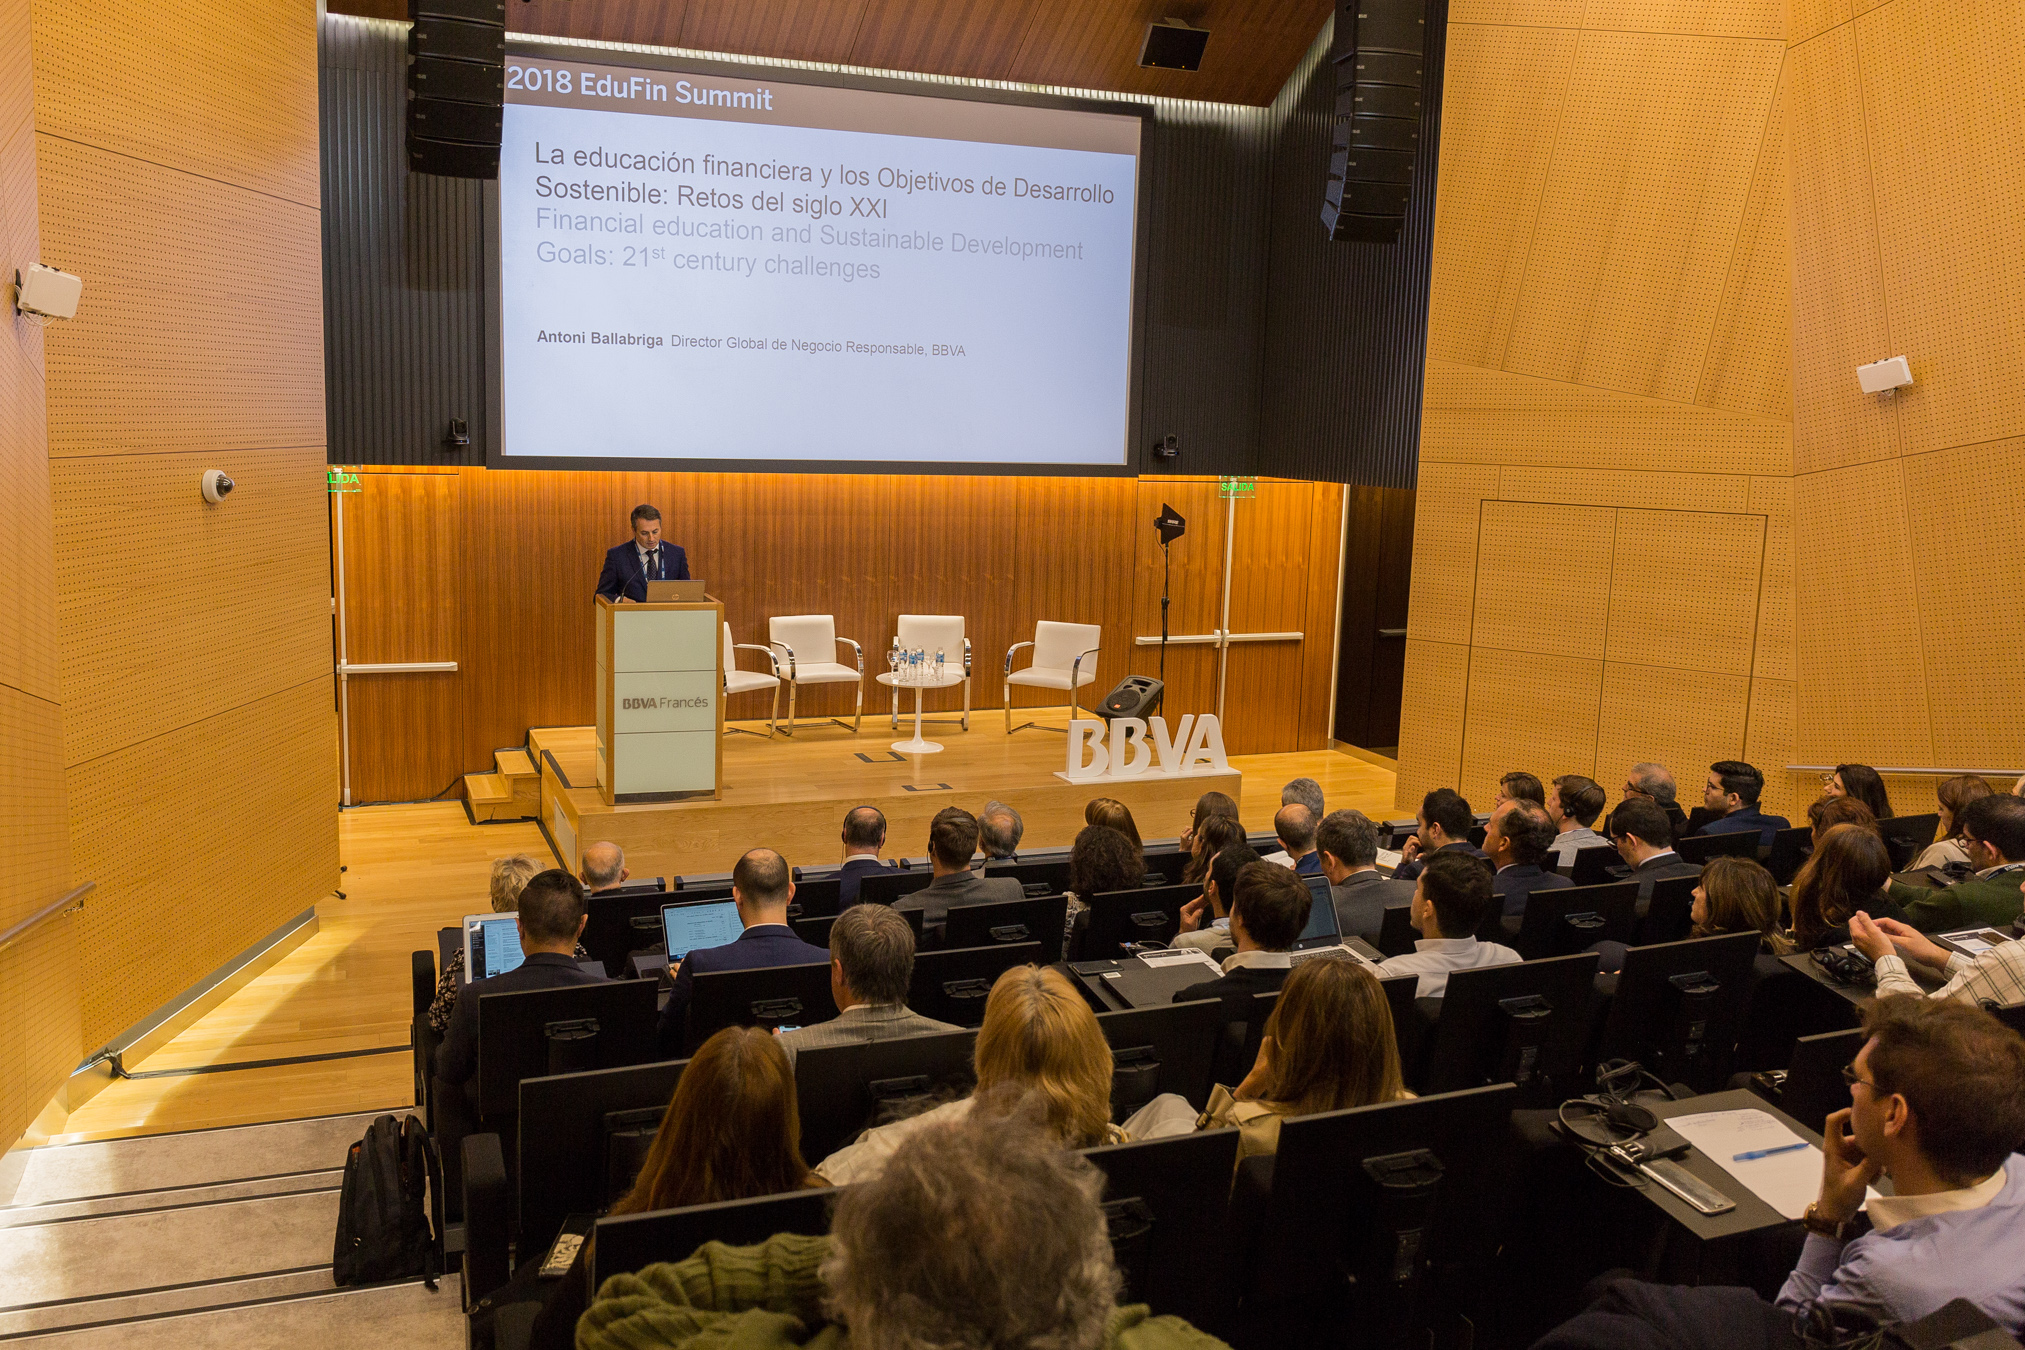 Financial education & Sustainable Development Goals (SDGs): 21st century challenges.